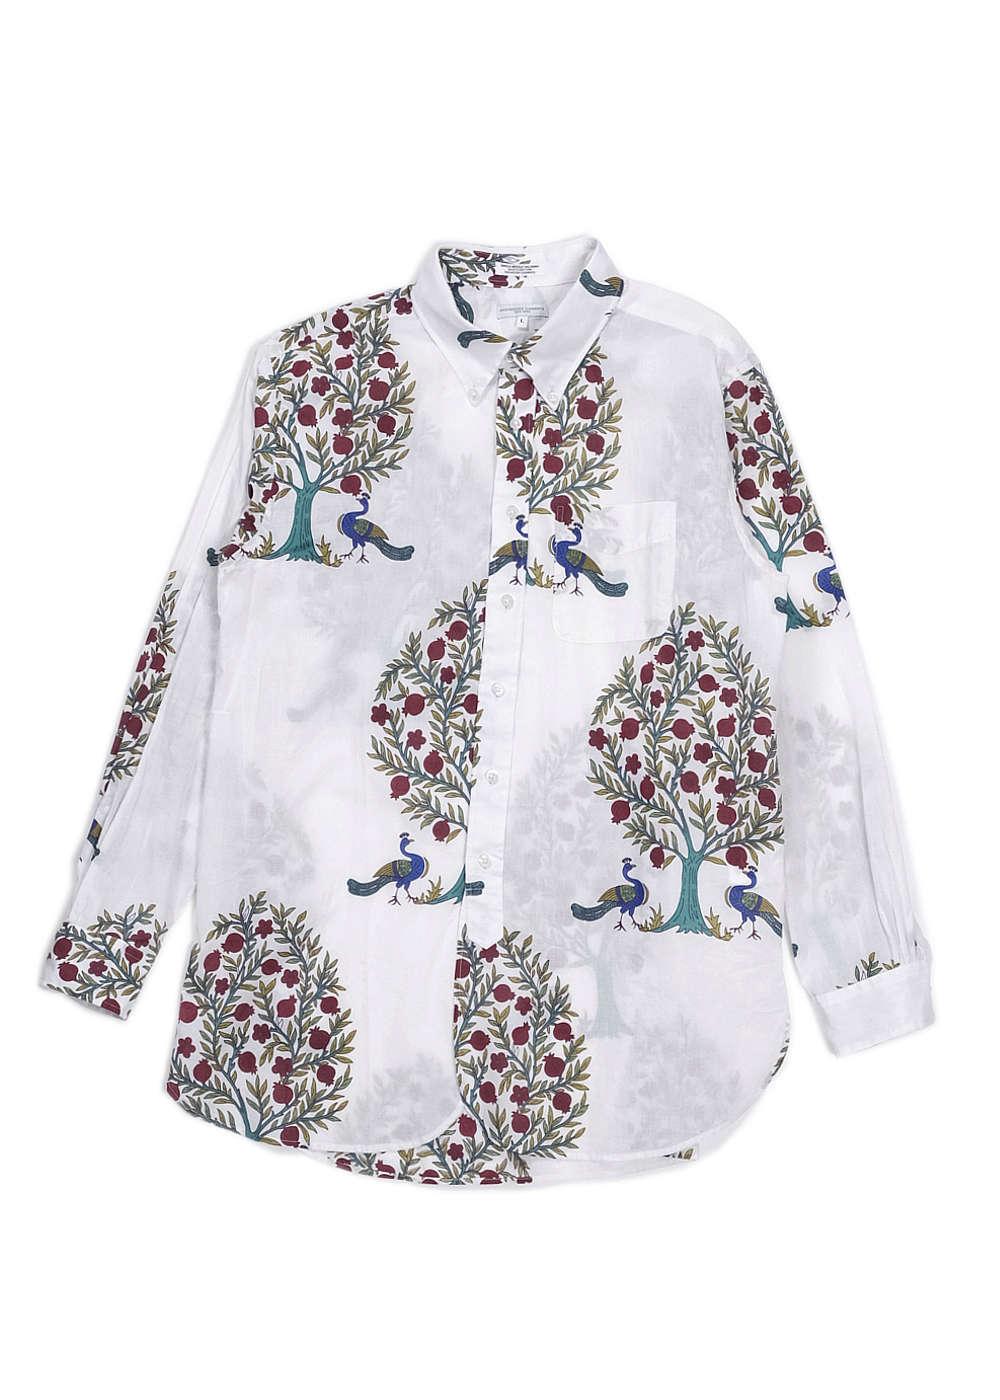 Engineered-Garments-19-Century-BD-Shirt-Natural-Cotton-Lawn-Peacock-Print-01